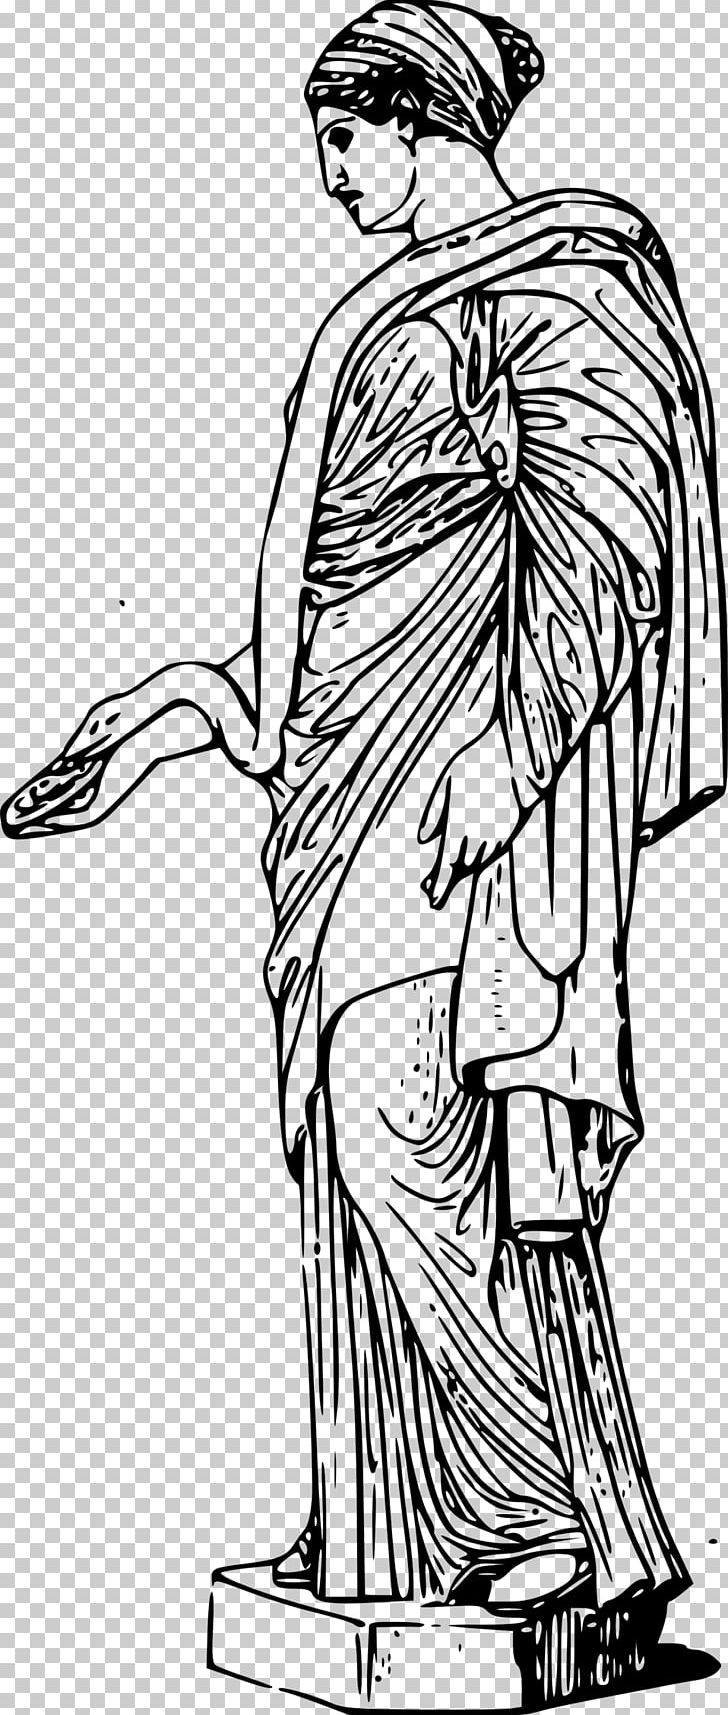 Ancient Greek Sculpture Statue PNG, Clipart, Ancient Greek.